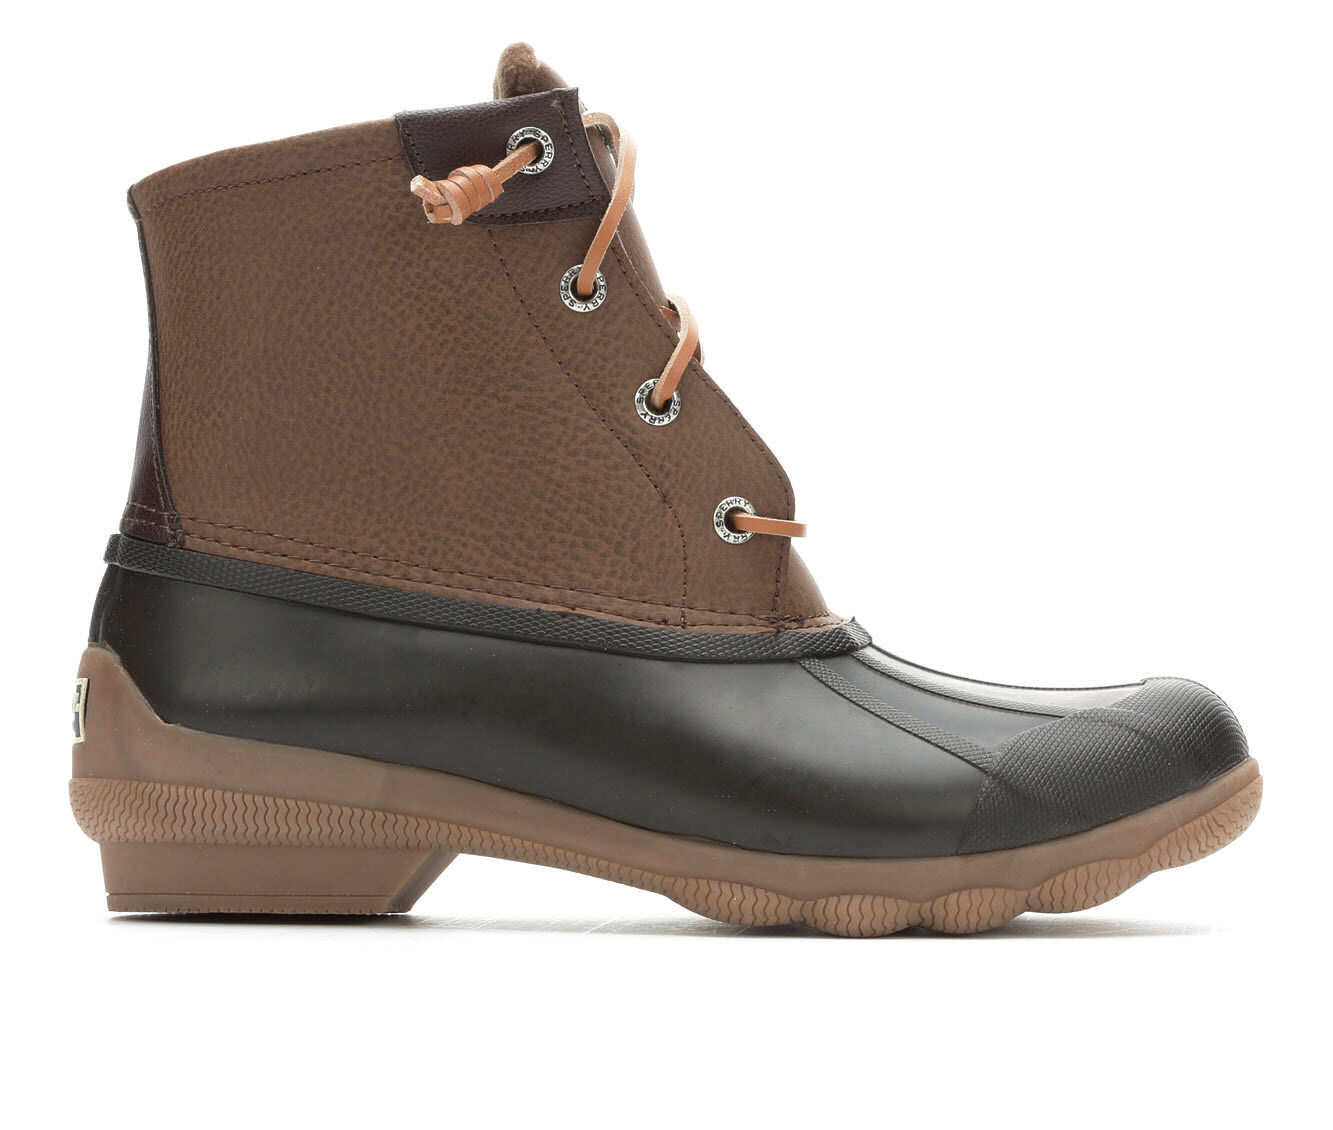 affordable Women's Sperry Syren Gulf Duck Boots Dark Brown/Tan